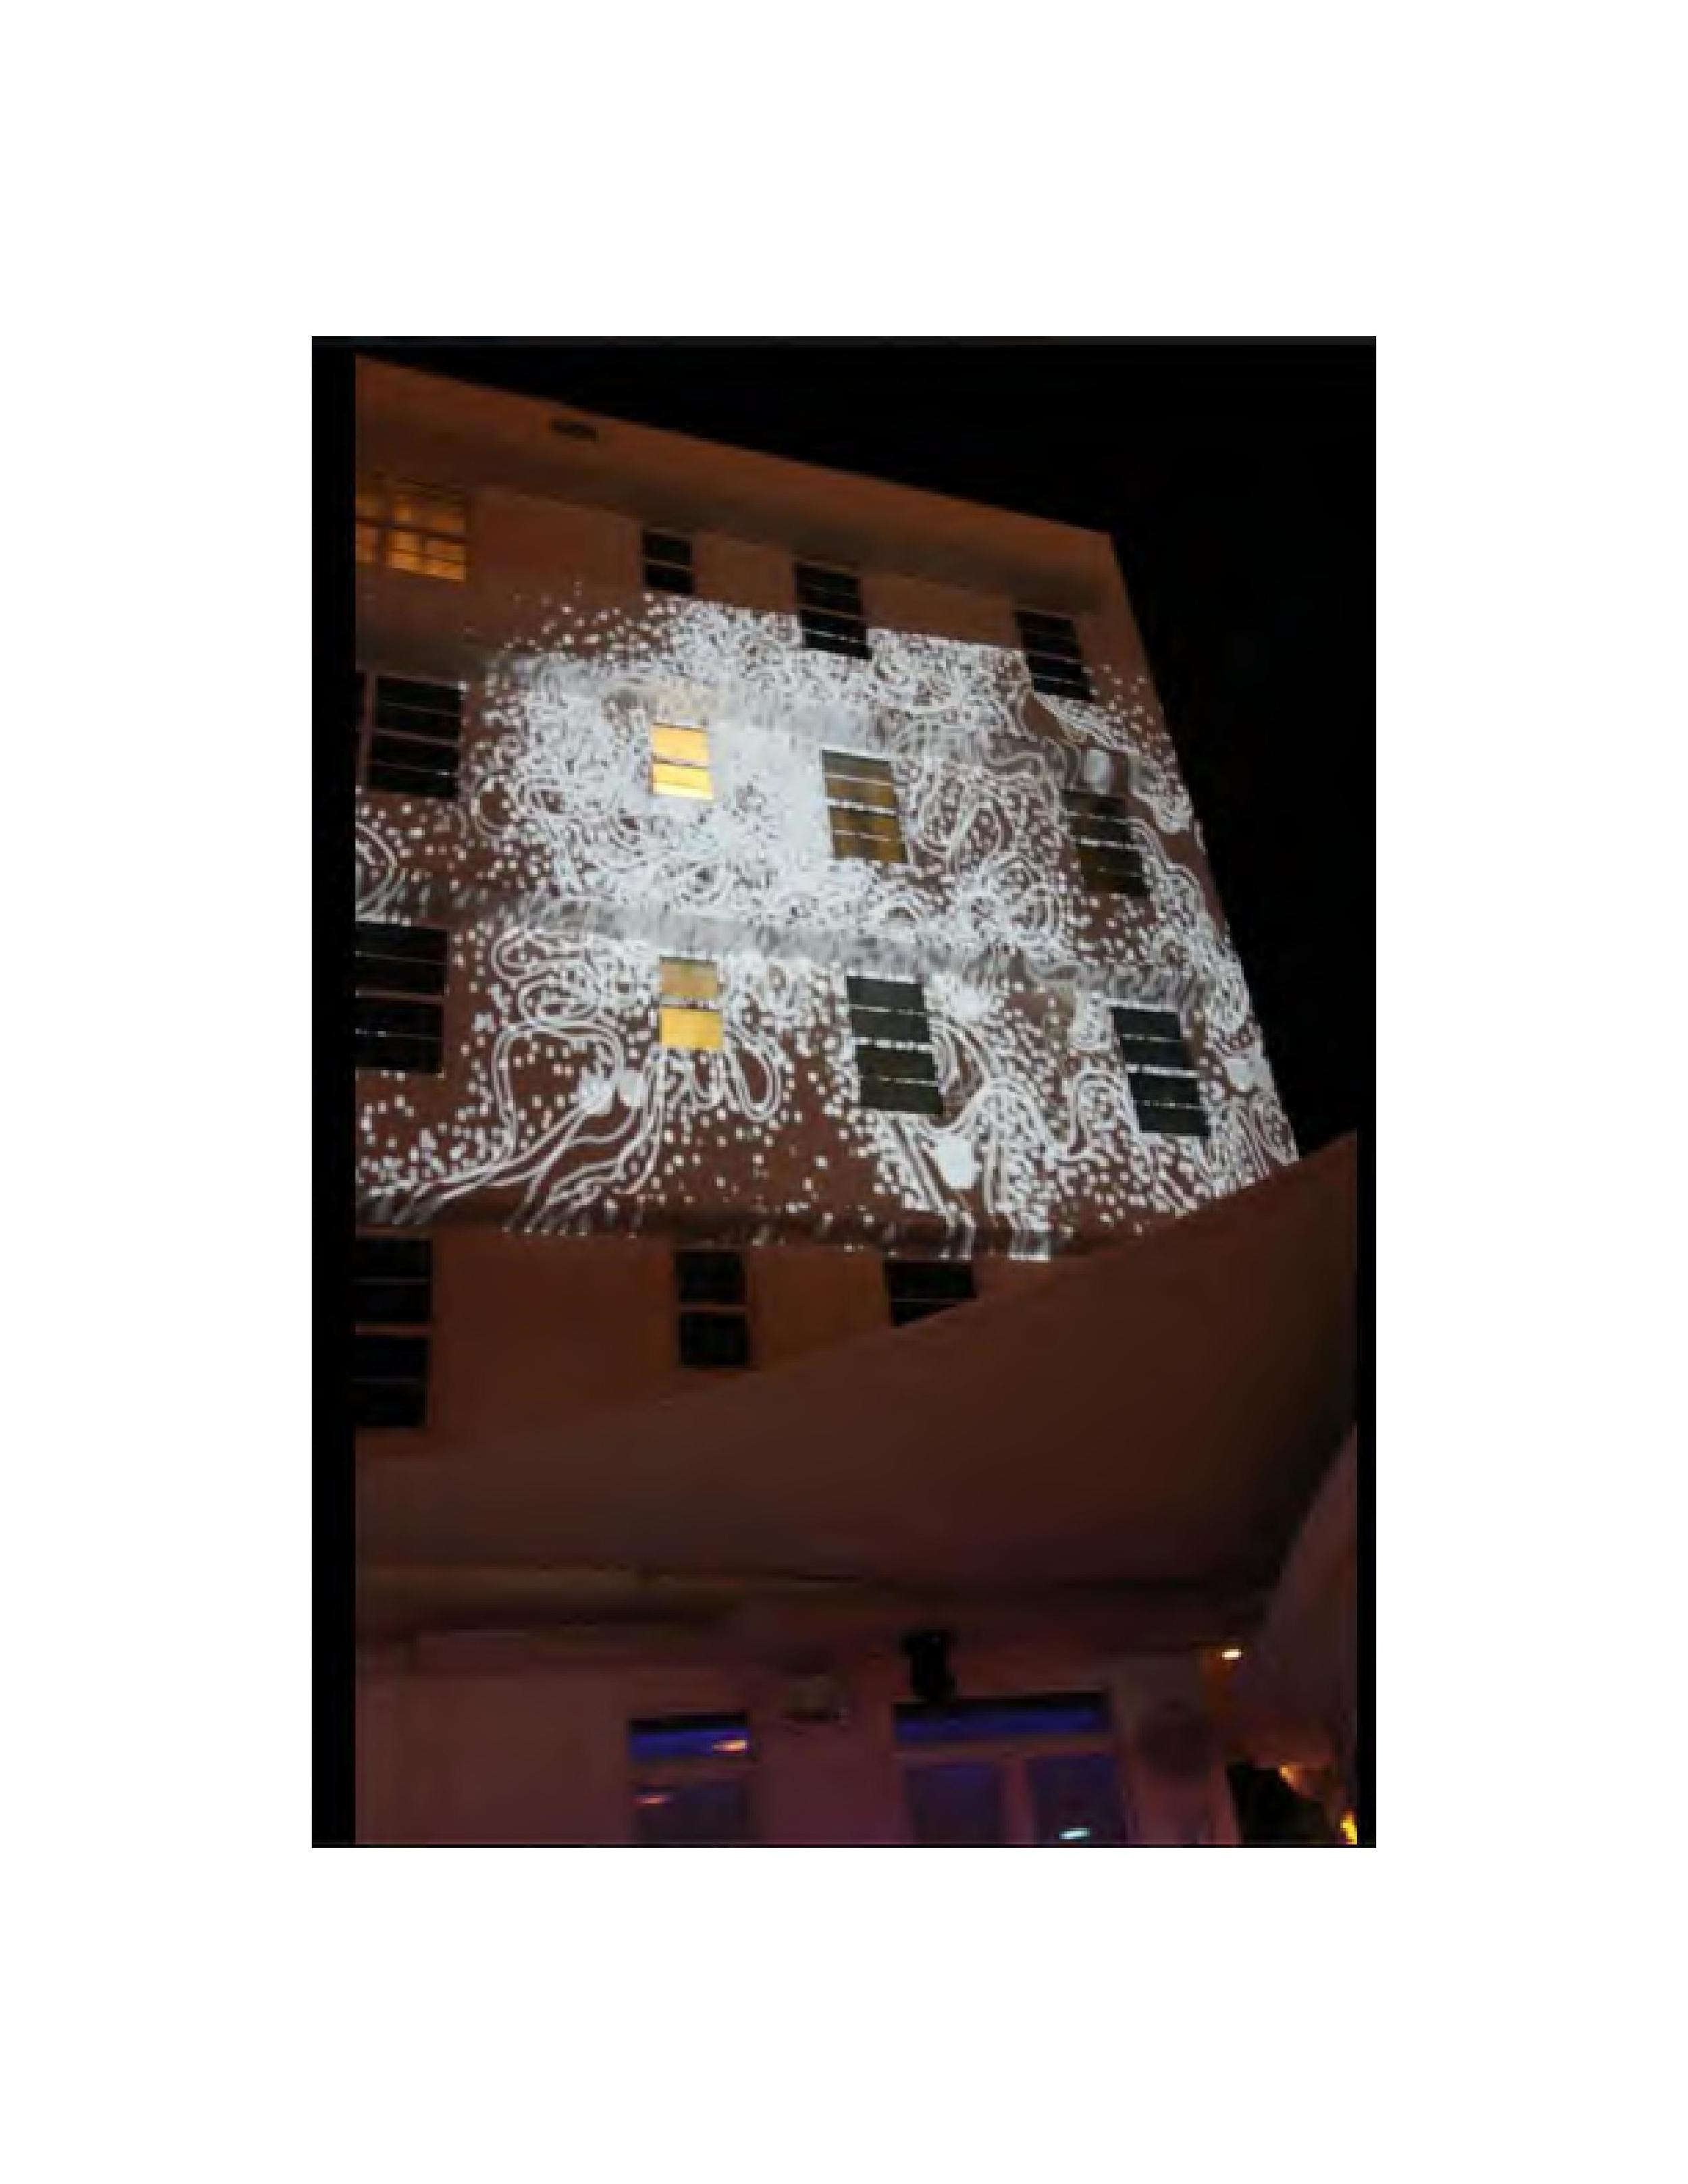 Miami_Art_Basel_Photographs-web-page-080.jpg